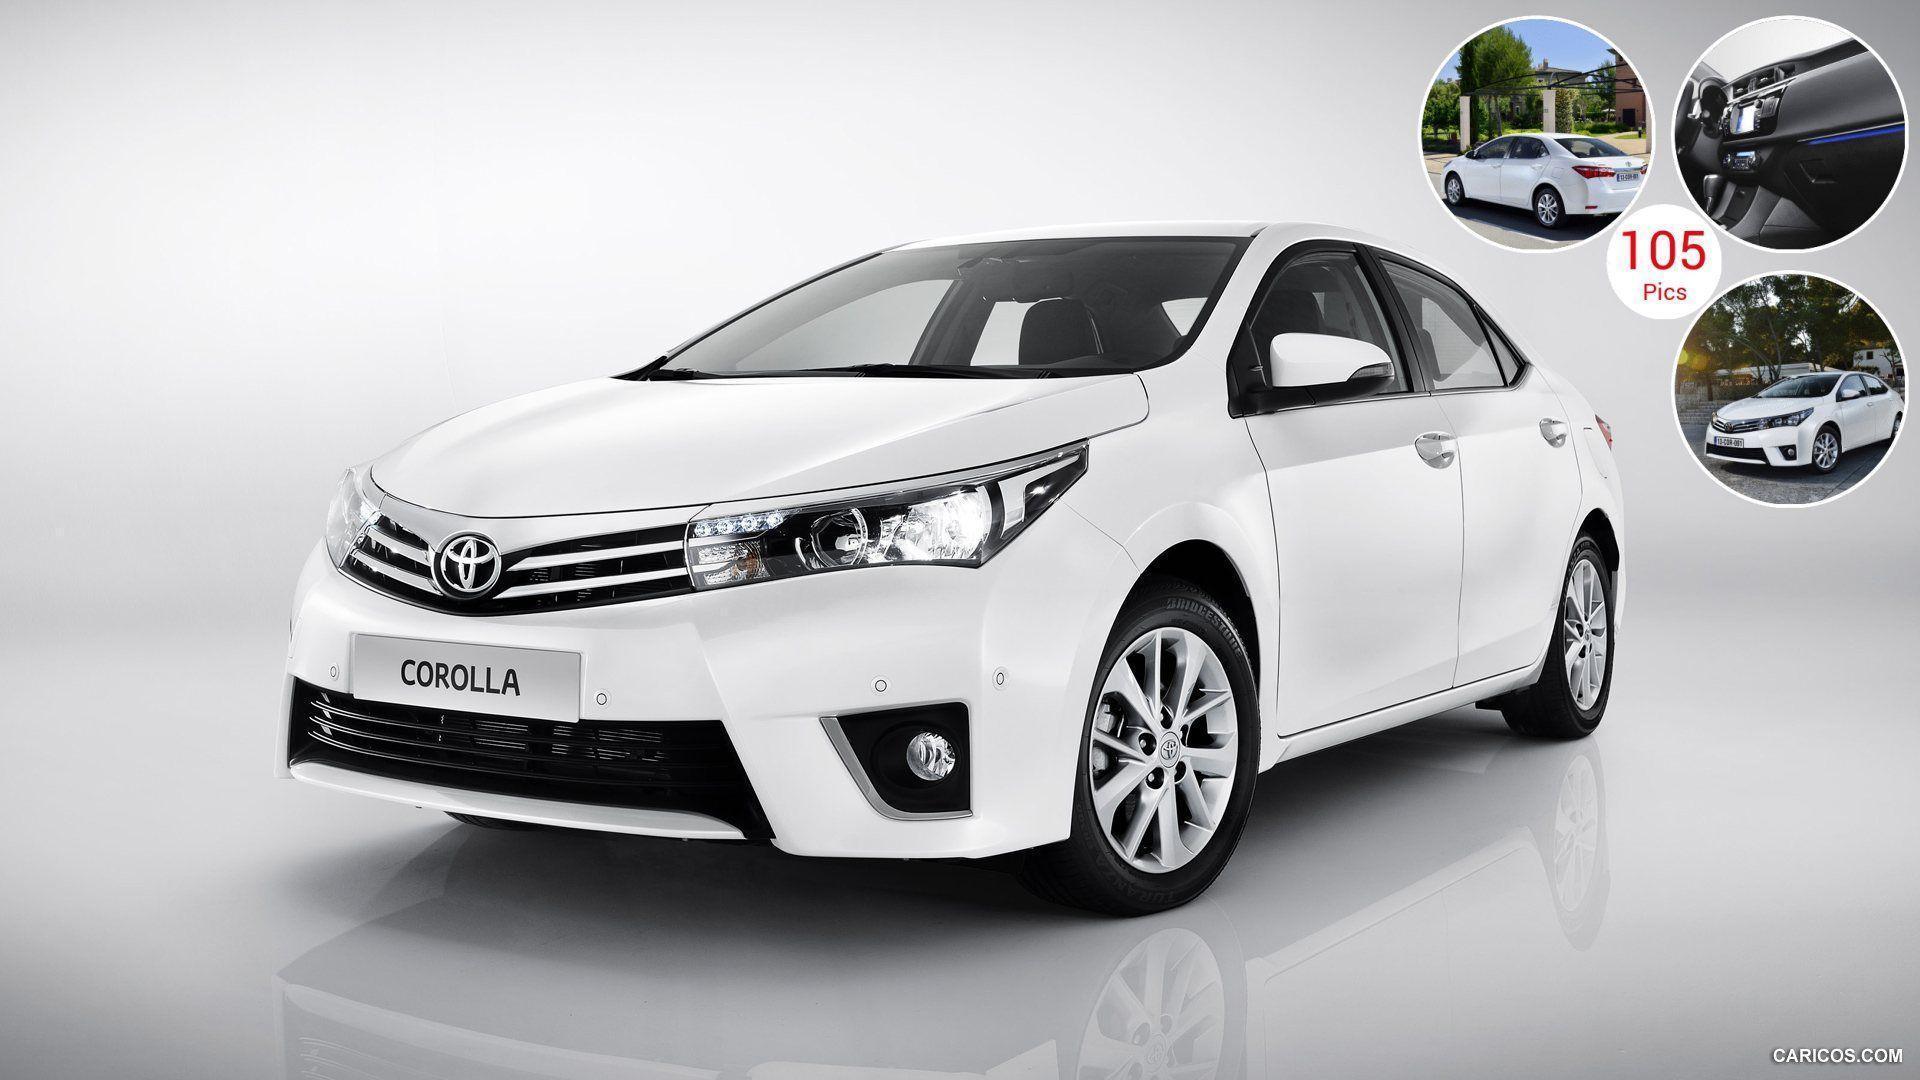 Toyota corolla wallpapers wallpaper cave 2014 toyota corolla euro version front hd wallpaper 87 voltagebd Gallery